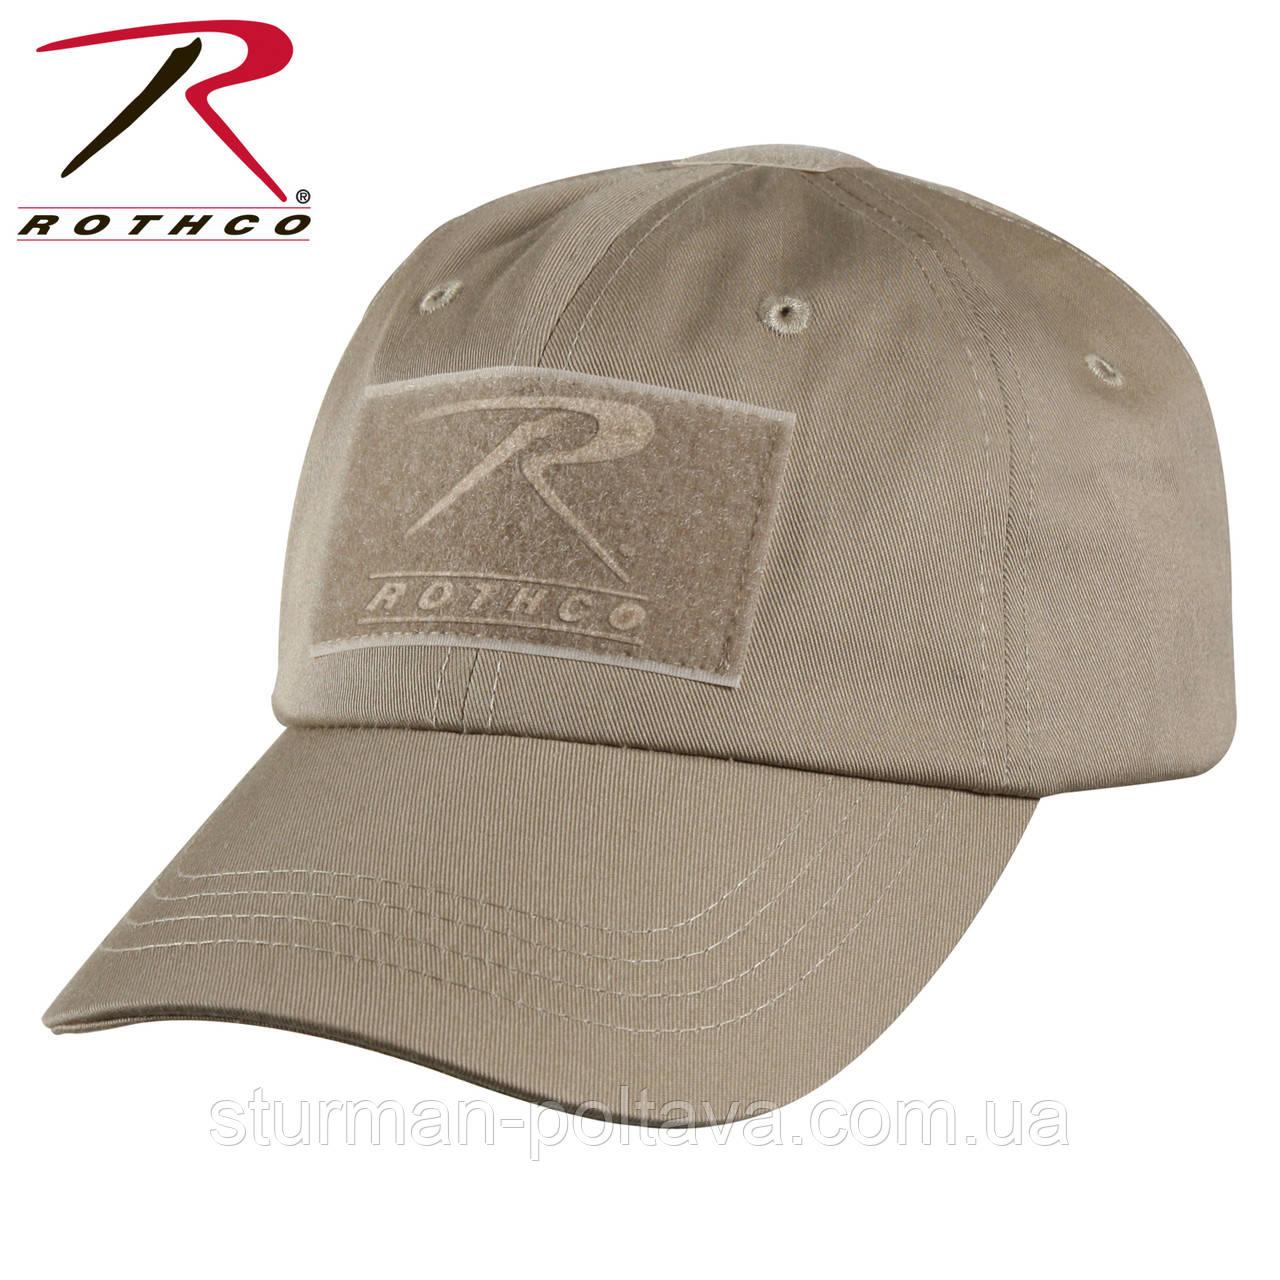 Бейсболка мужская тактическая   PMC - Private Military Company  цвет  хаки   Rotcho  США